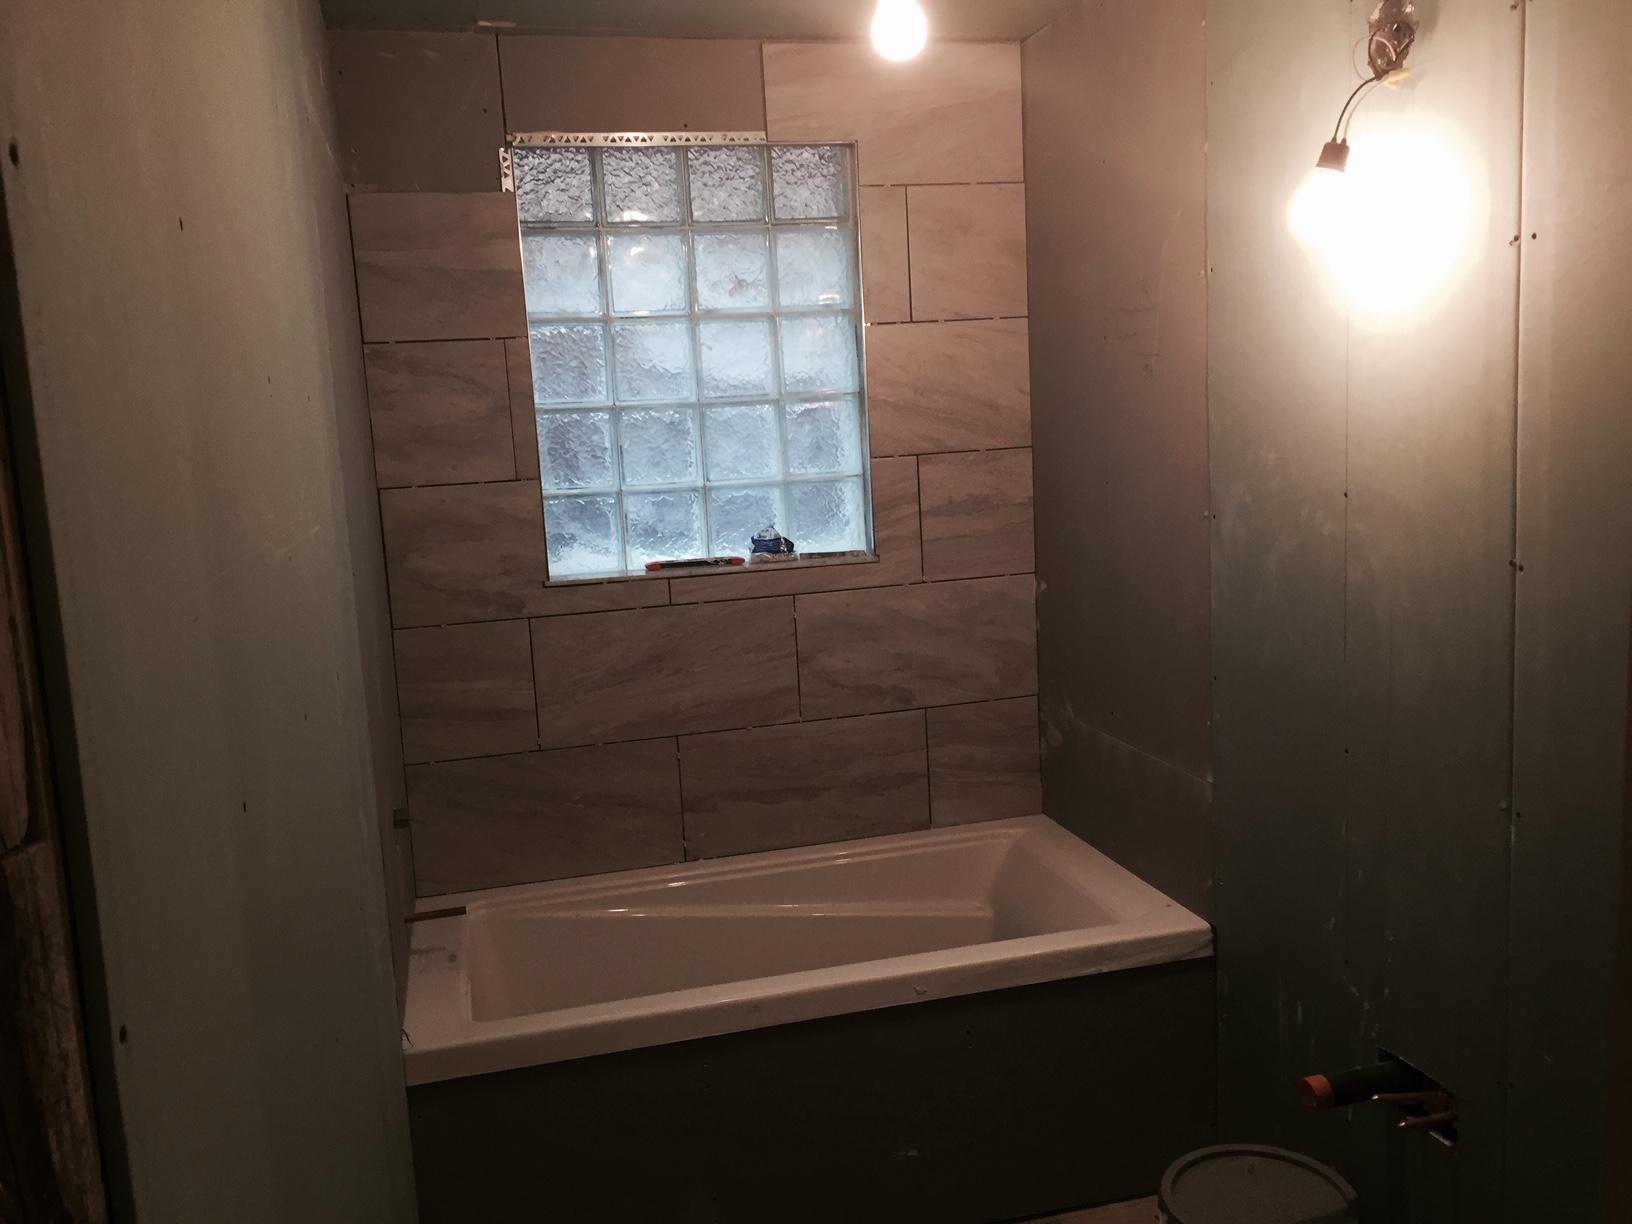 tub-plumbing-under-construction-plumbing